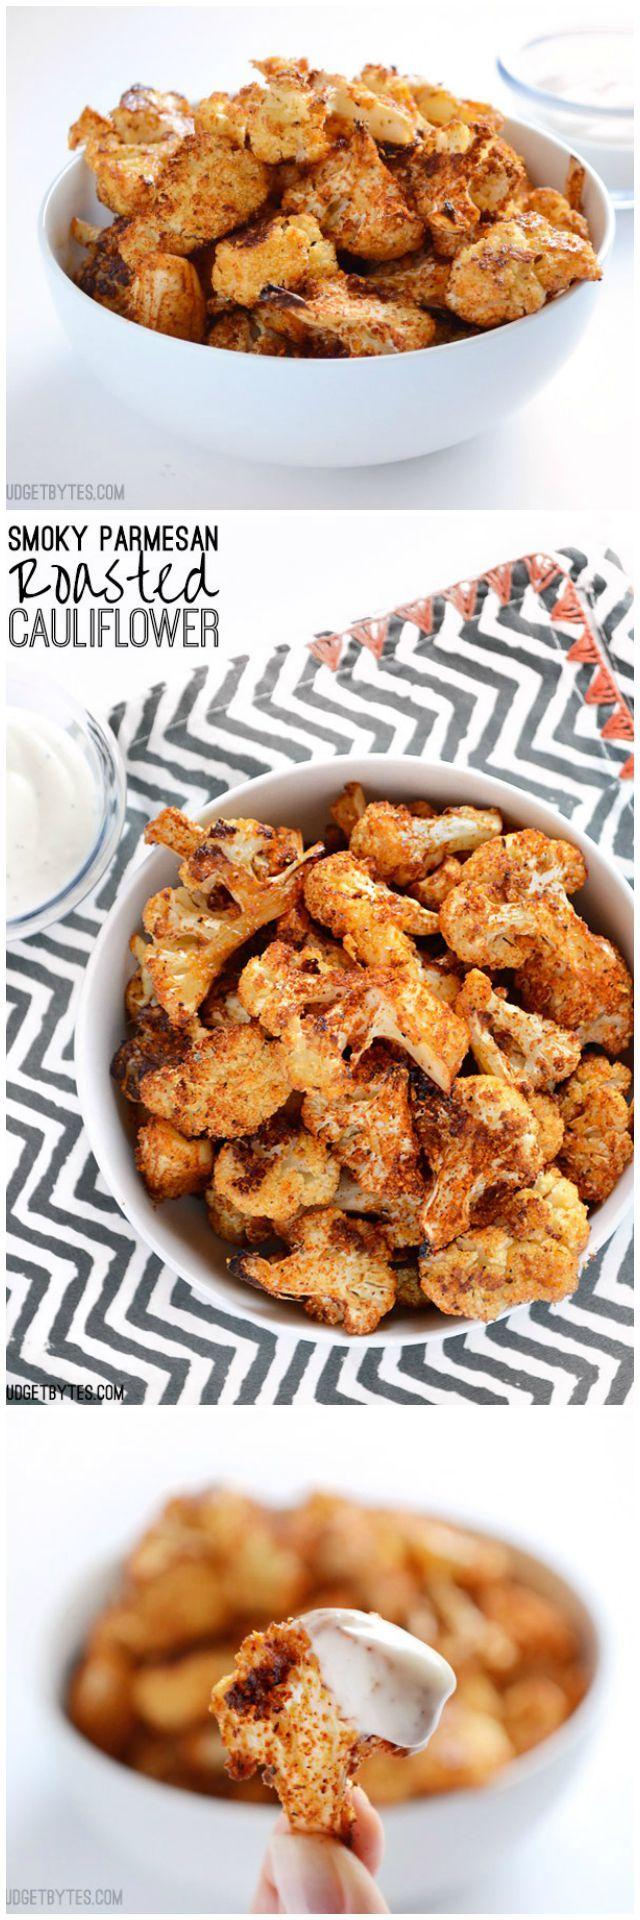 Smoky Parmesan Roasted Cauliflower - BudgetBytes.com